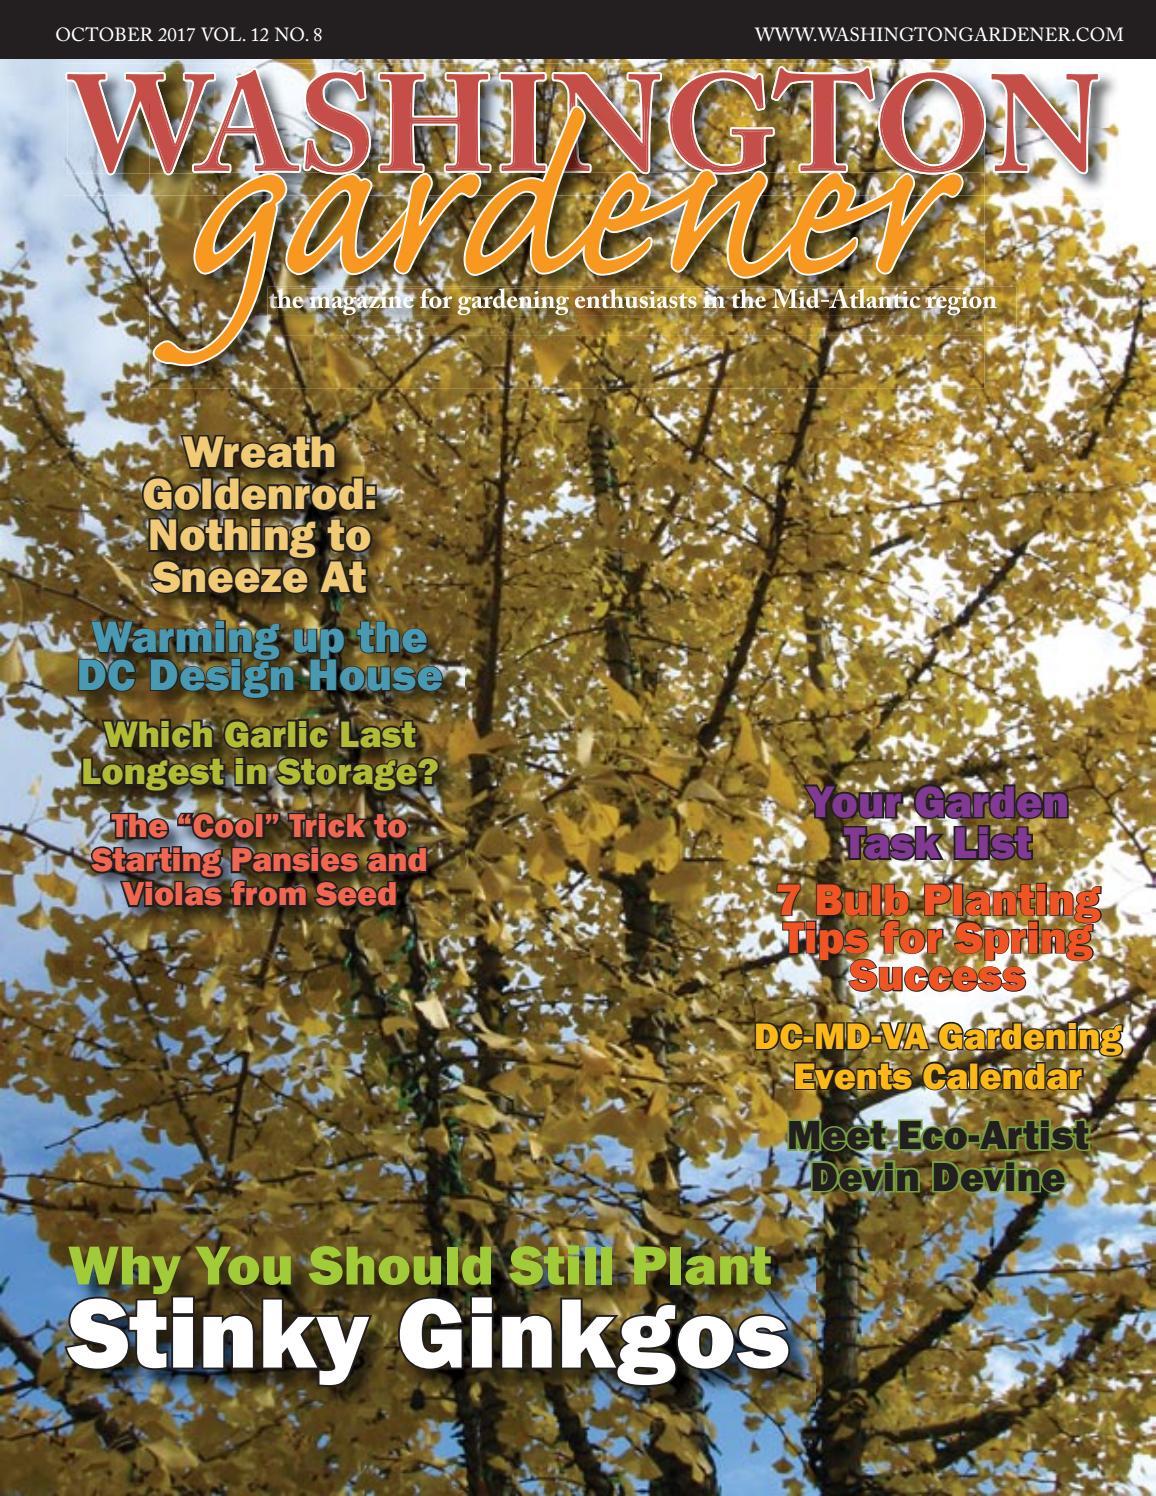 Washington Gardener October 2017 by Kathy J - issuu